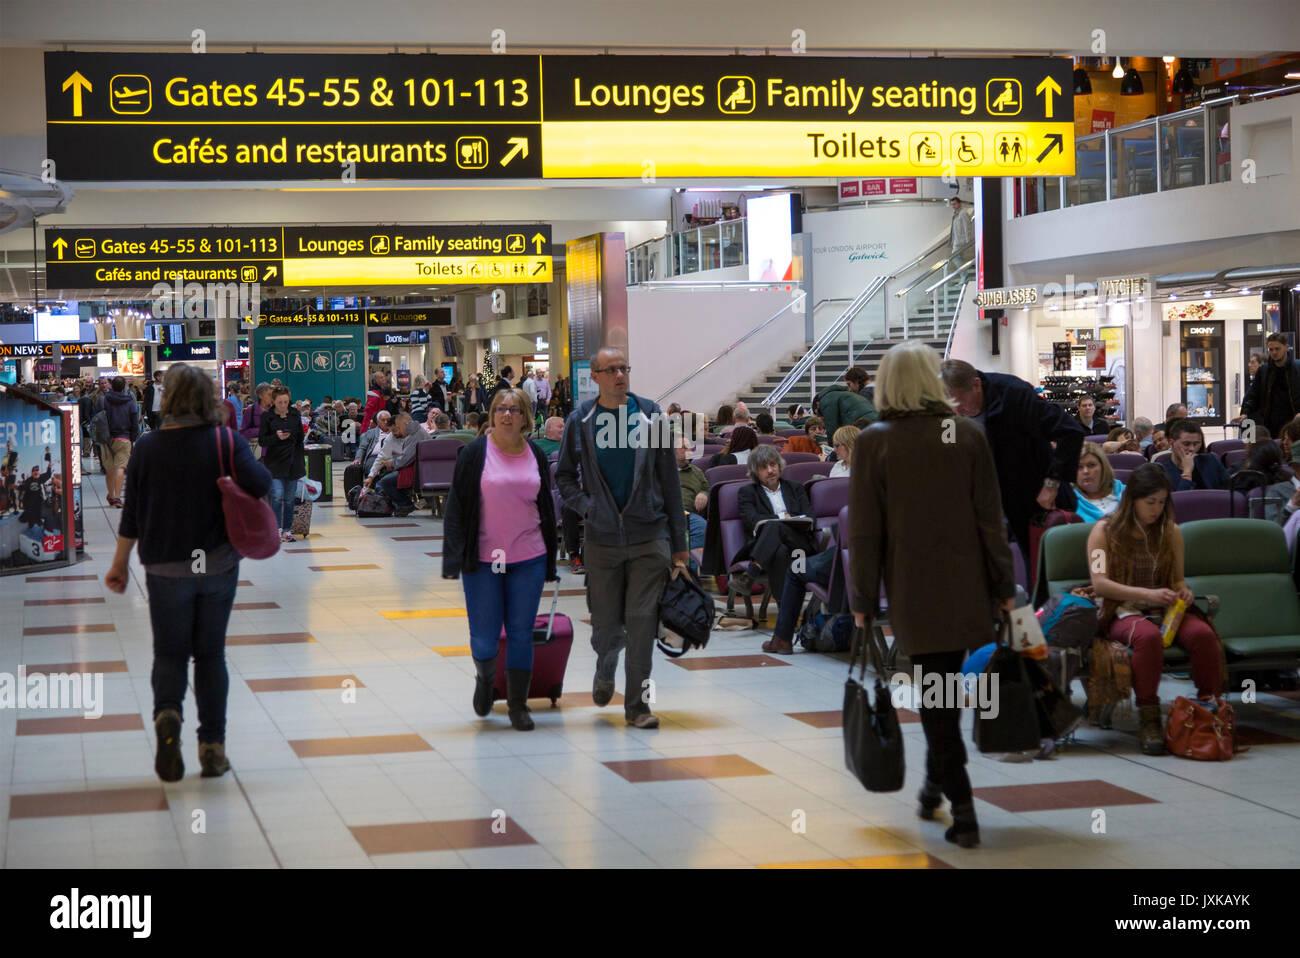 Gatwick airport departures lounge england stock photos gatwick airport departures lounge - Bureau de change crawley ...